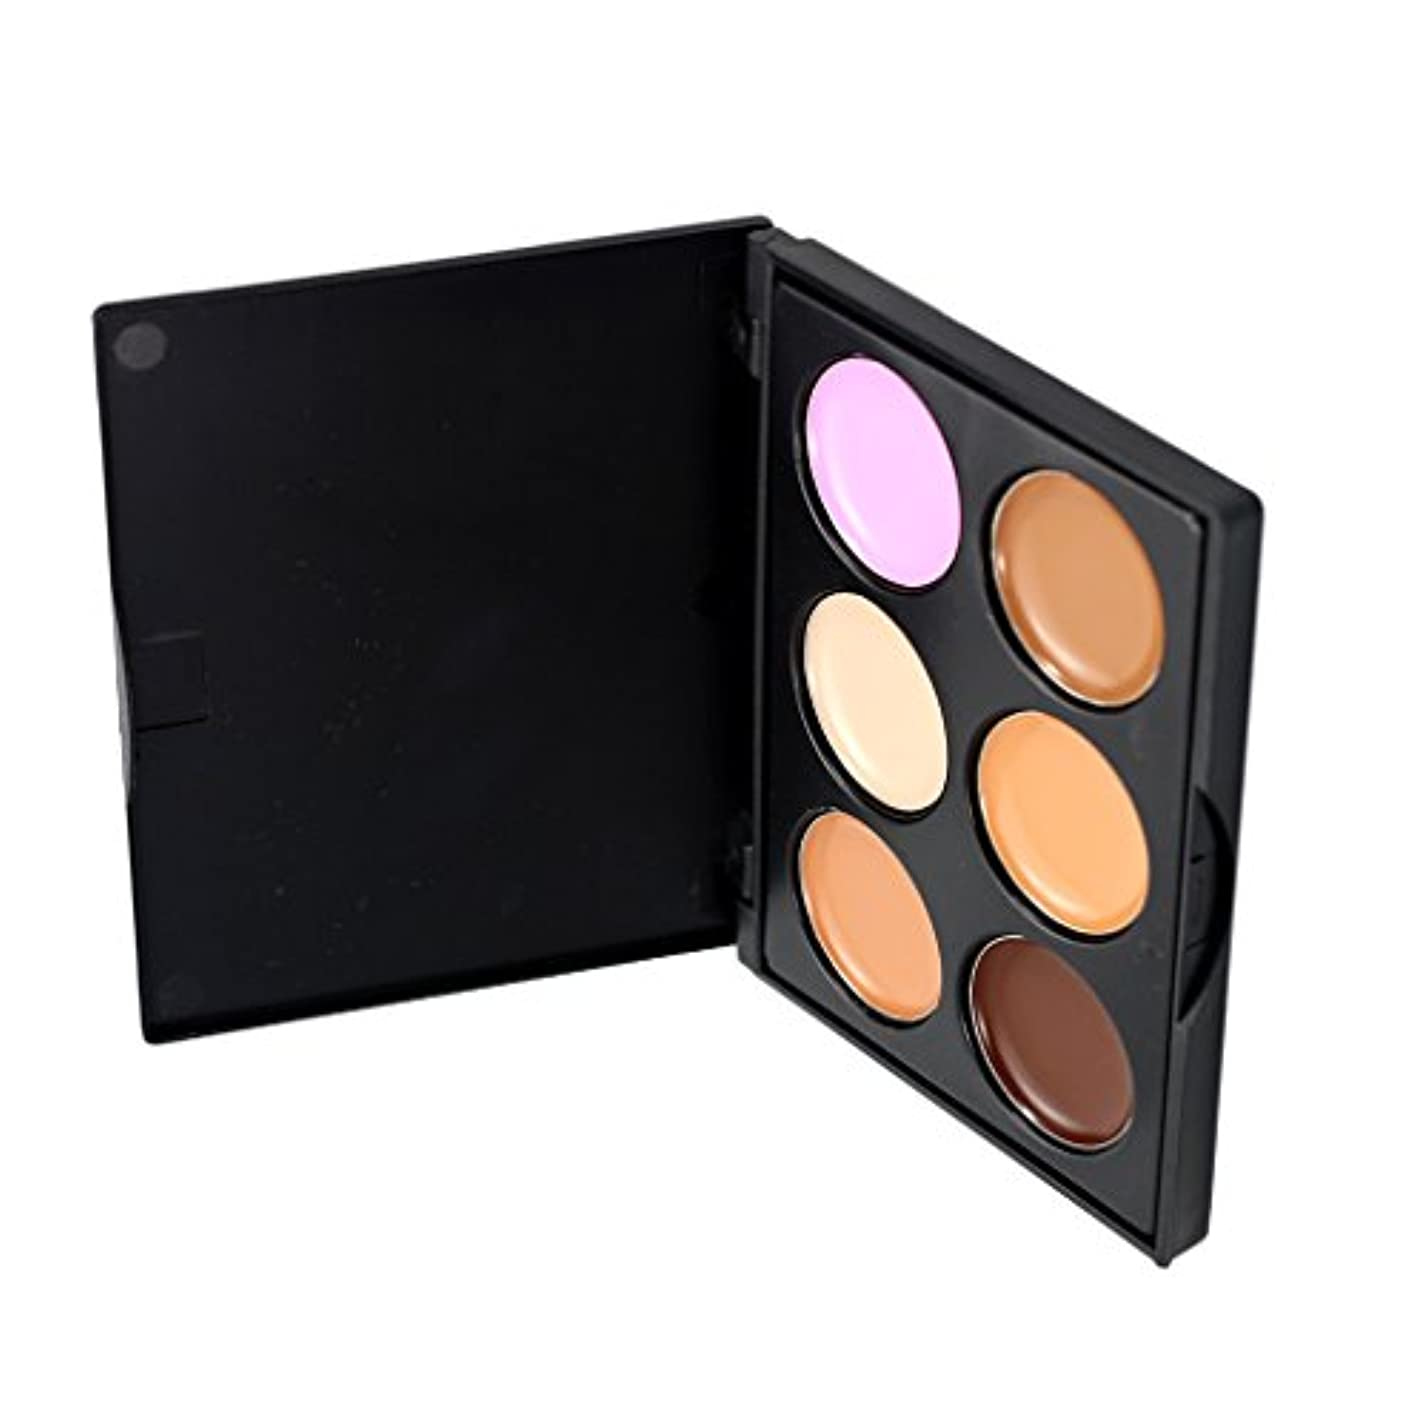 Kesoto コンシーラー 6色パレット 化粧用 コンター フェイス 全3種選択可能     - #2